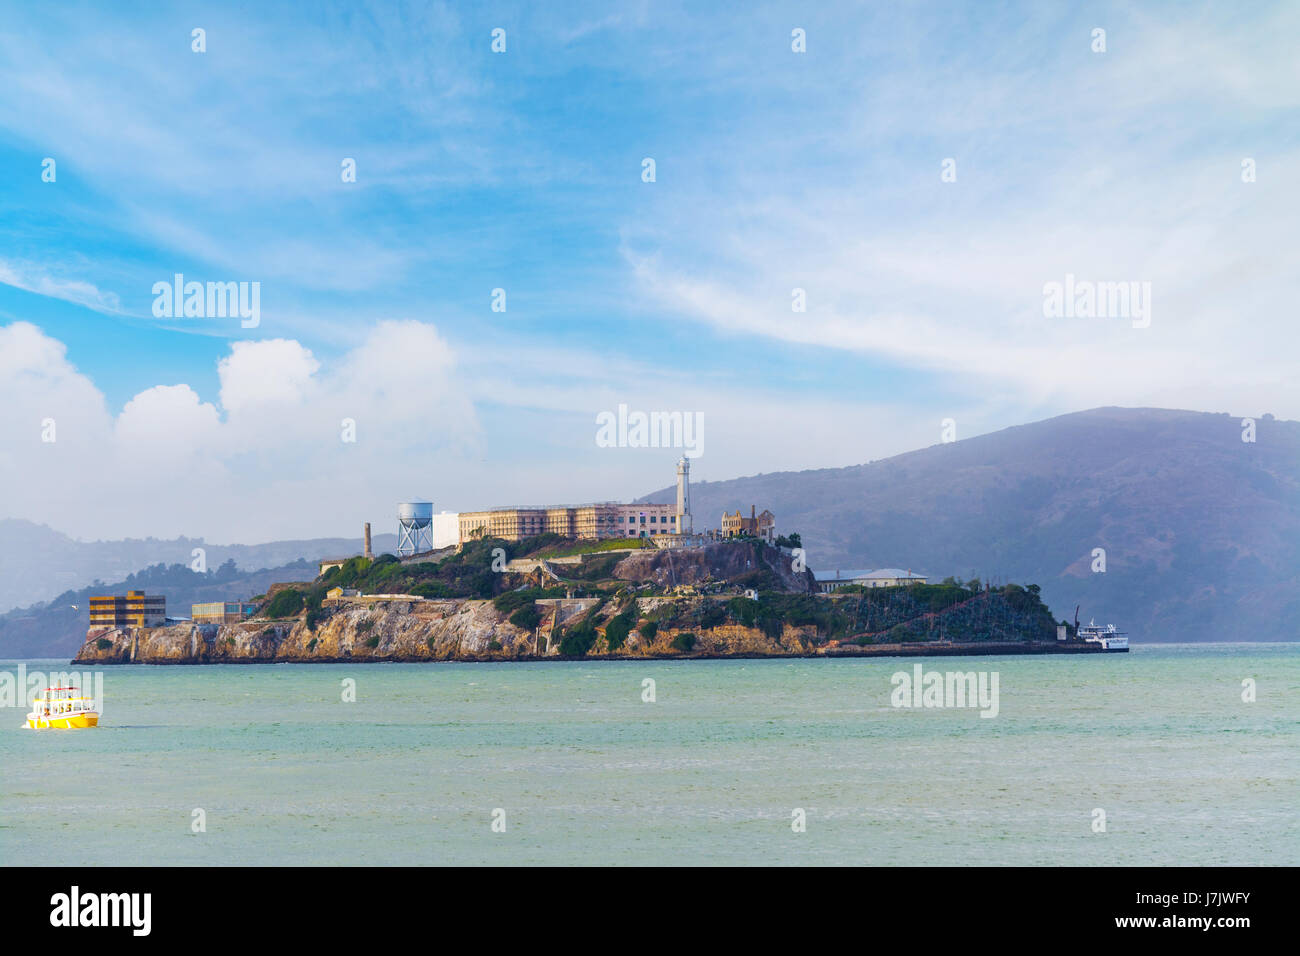 clouds over Alcatraz island - Stock Image